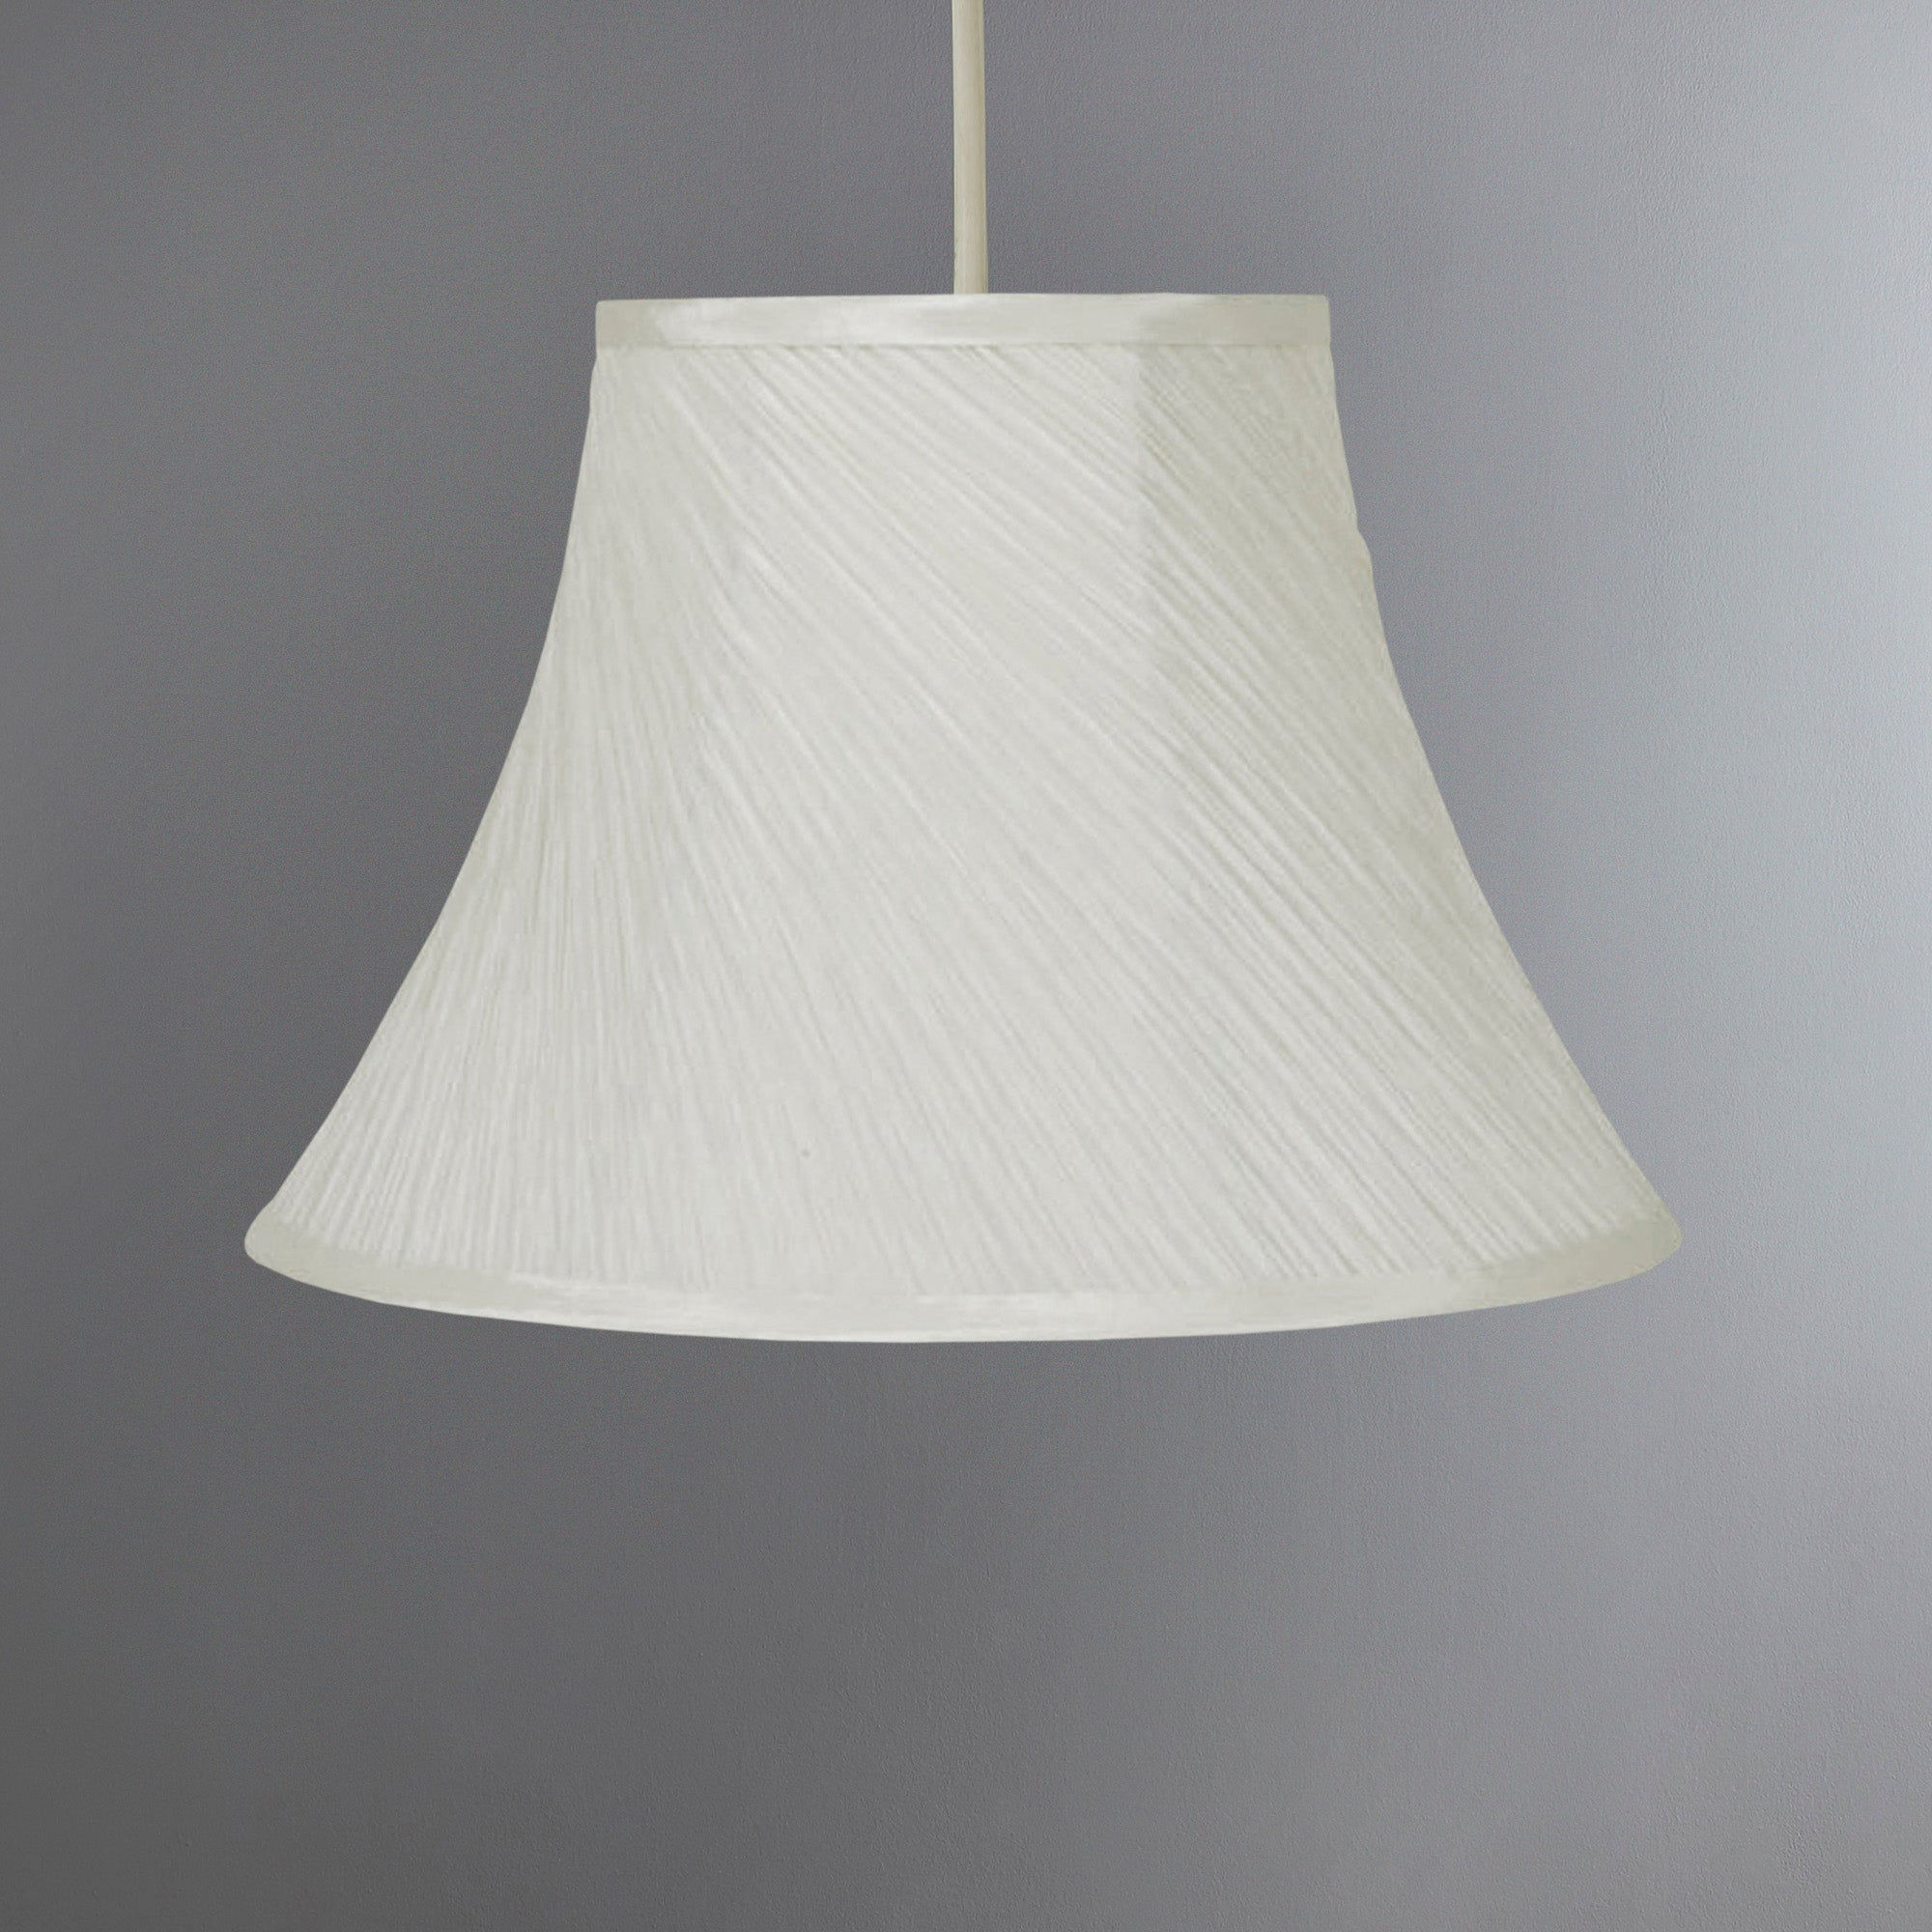 Swirl Mushroom Pleat Lampshade